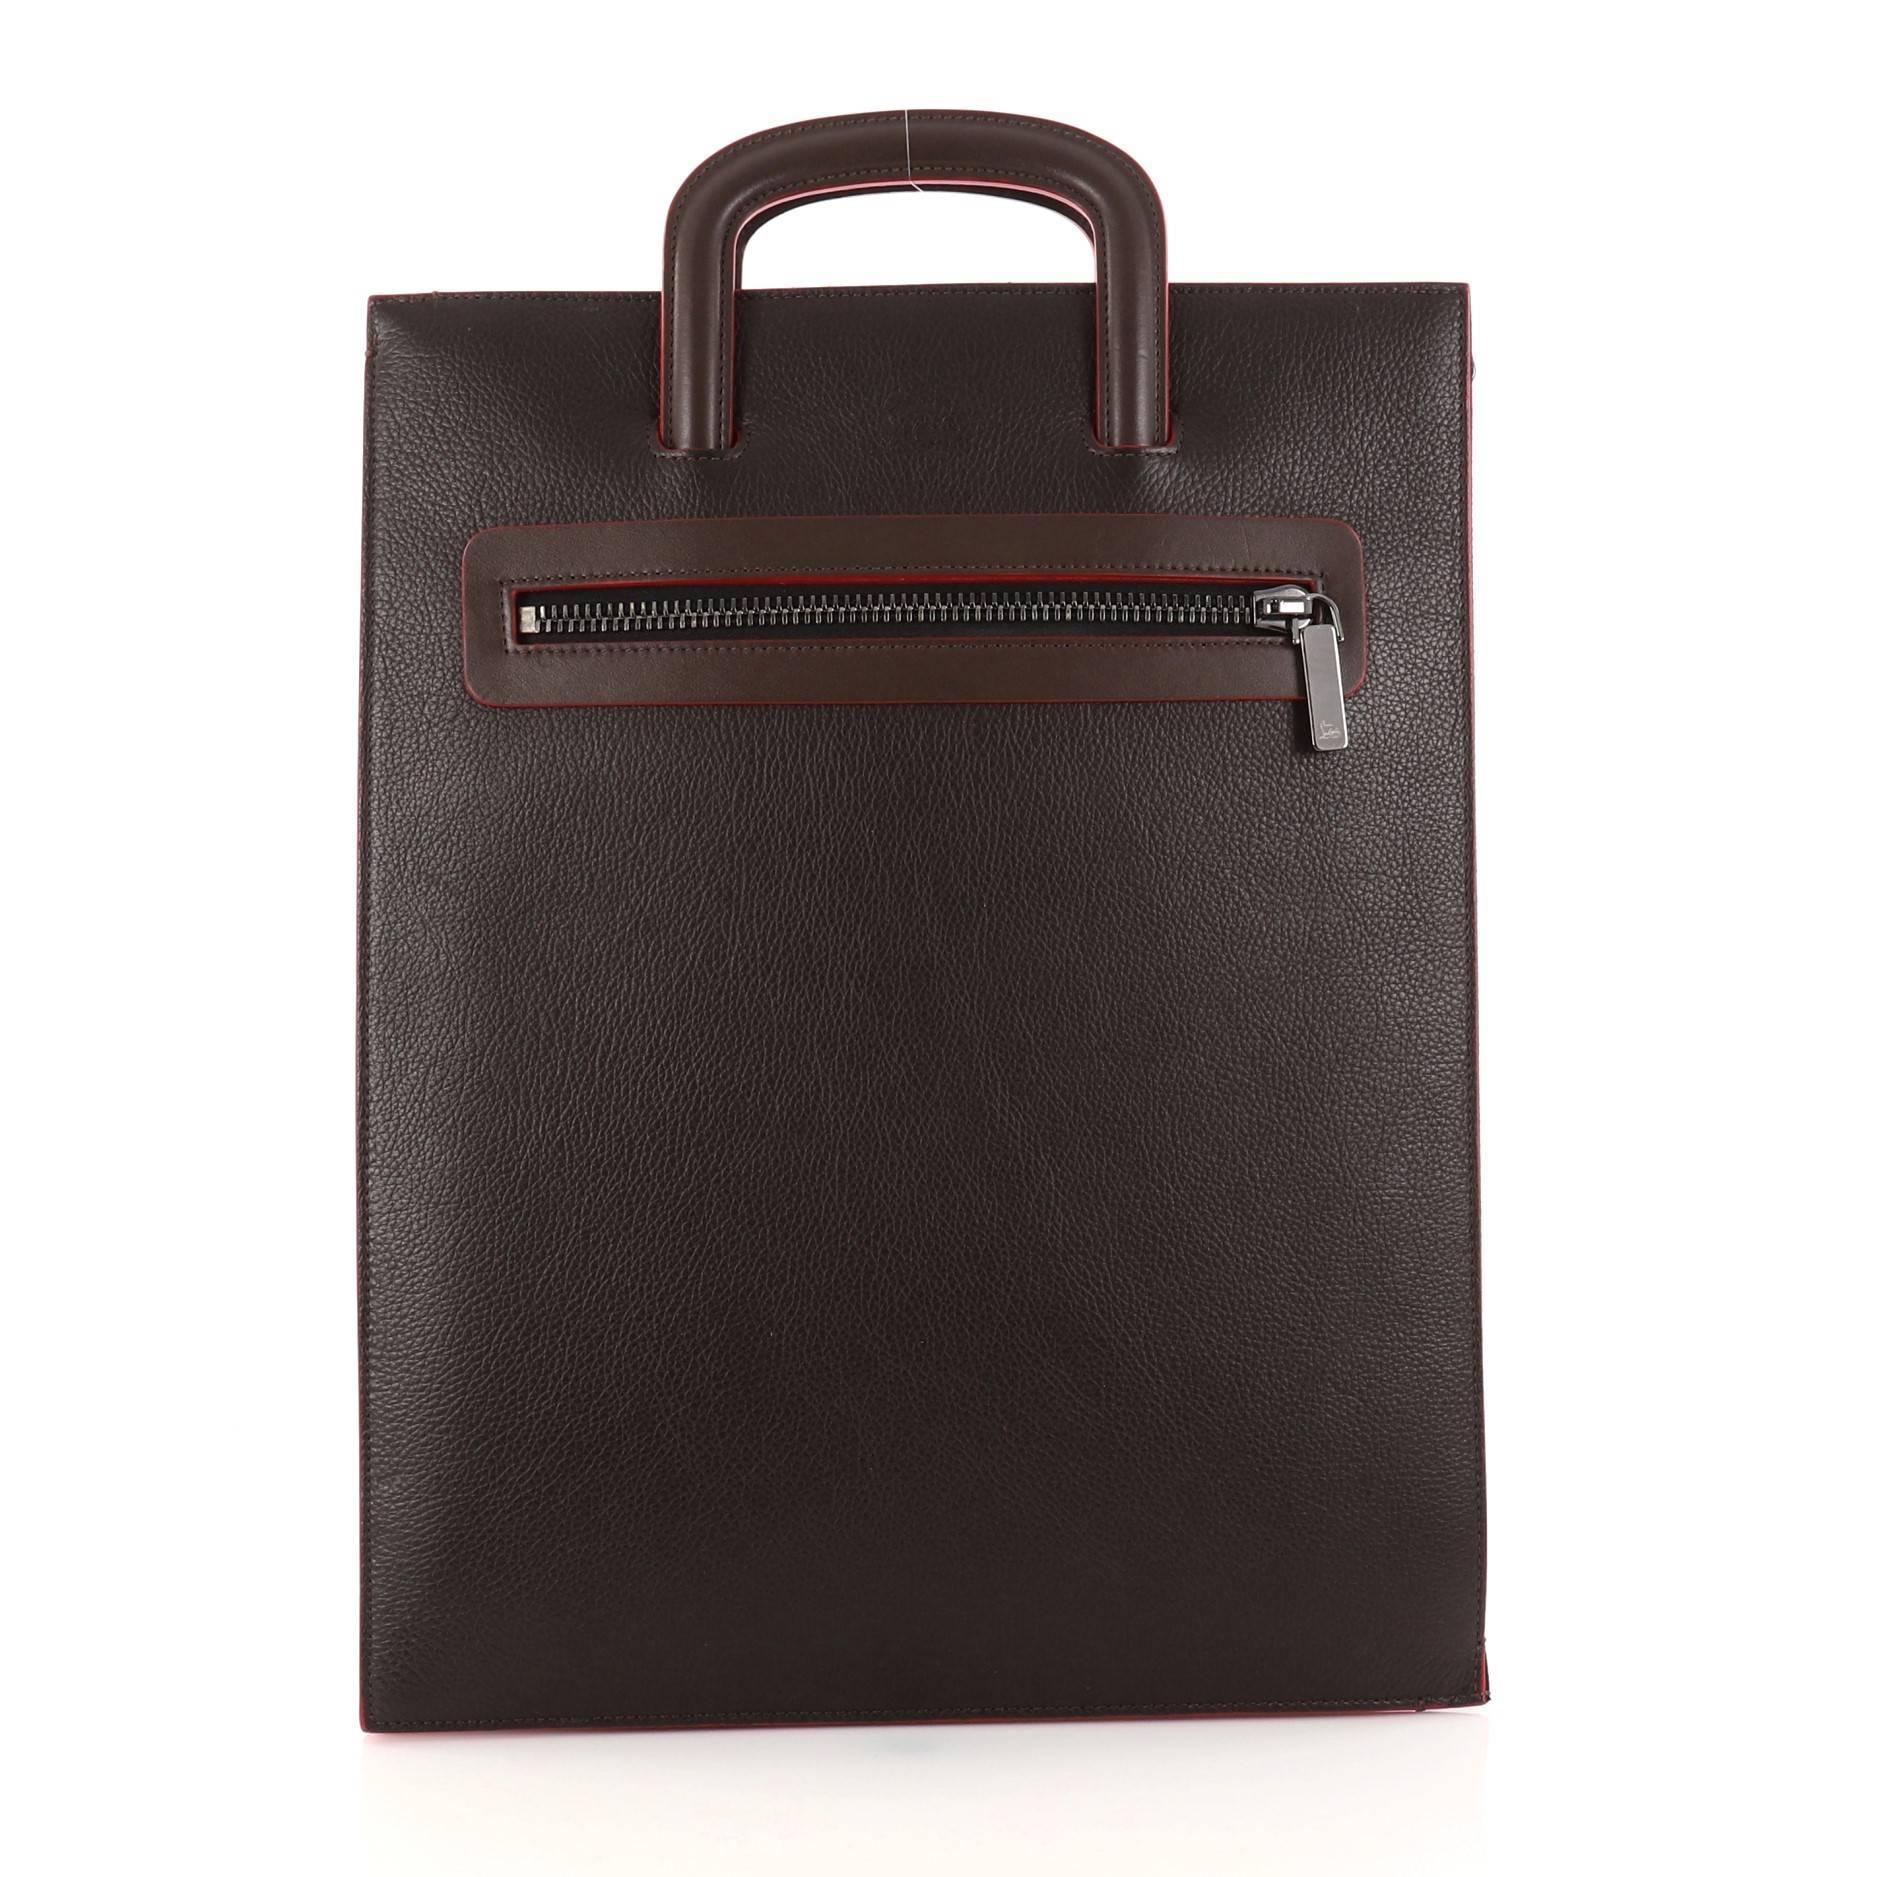 Christian Louboutin Black Leather Drawstring Studded Bag KGd7pHQ